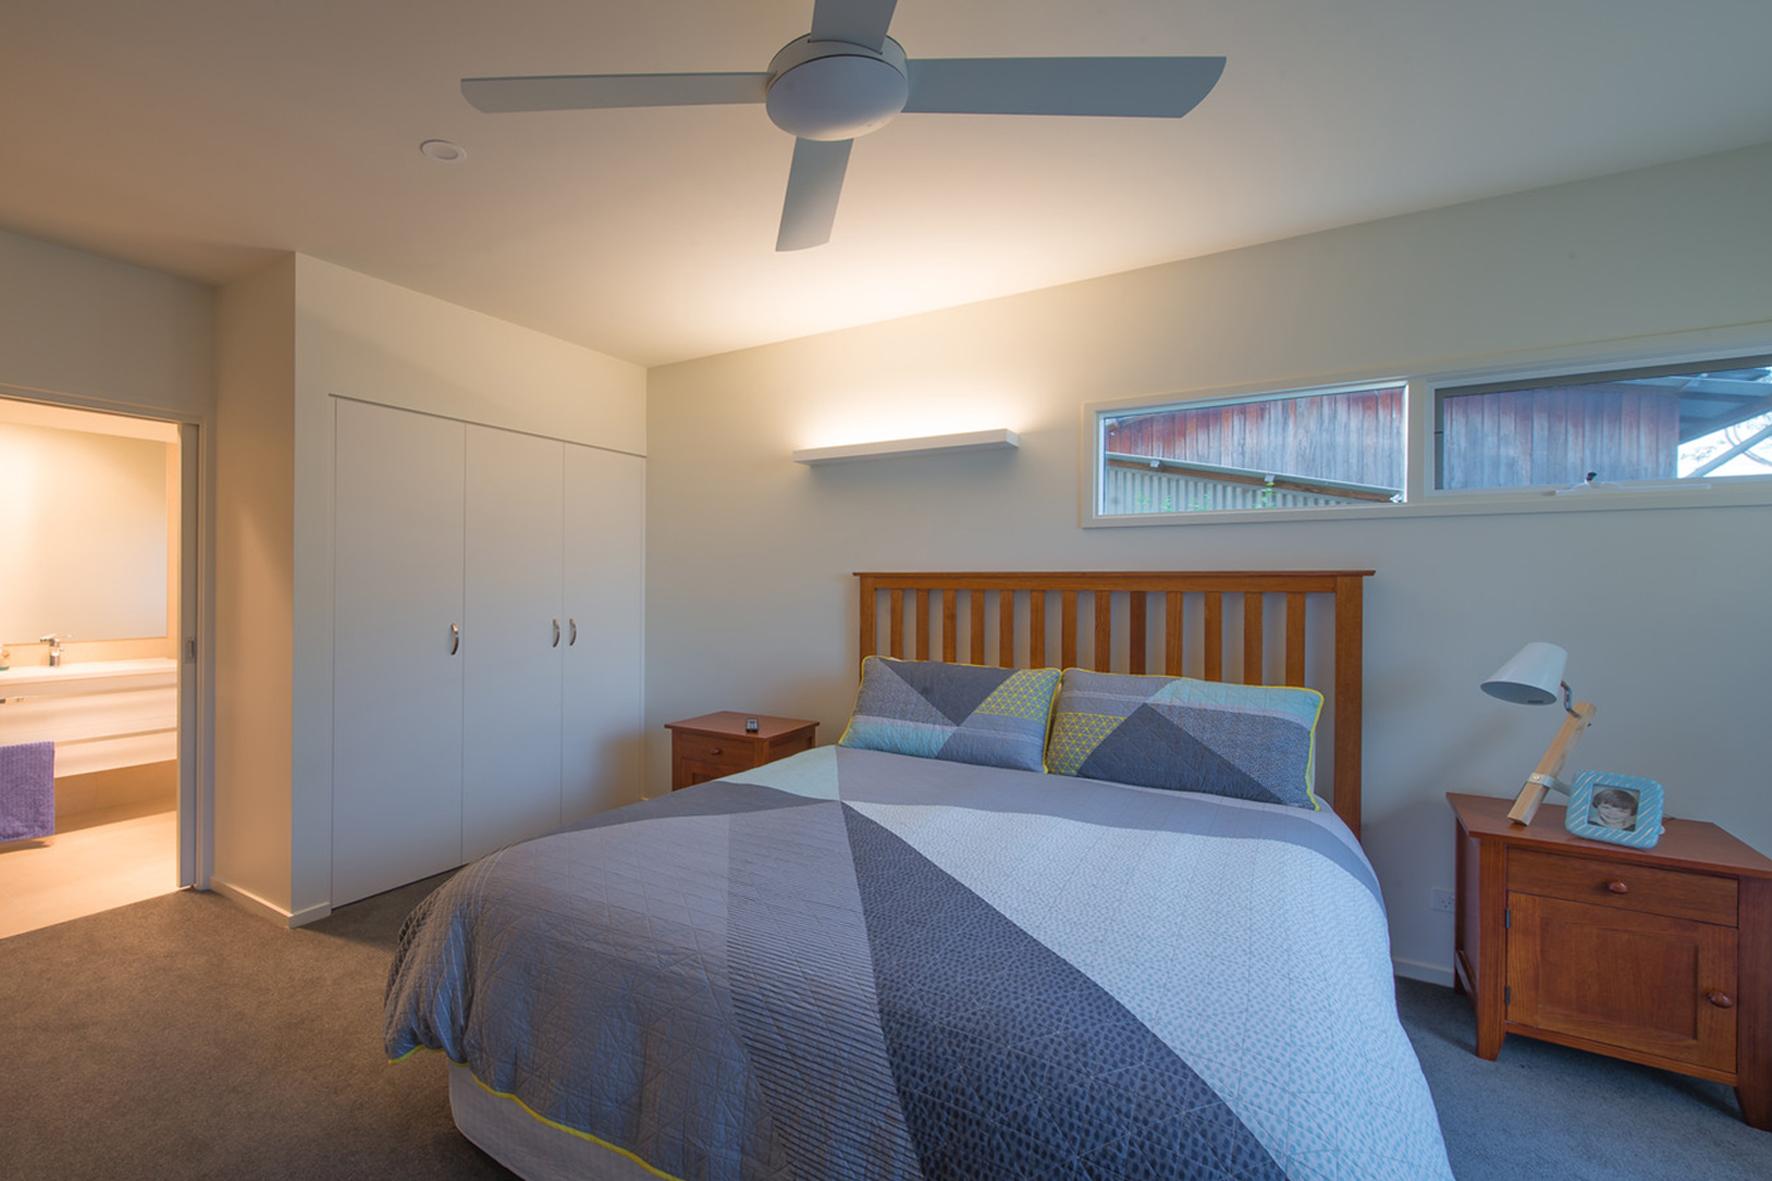 Ledge bedroom